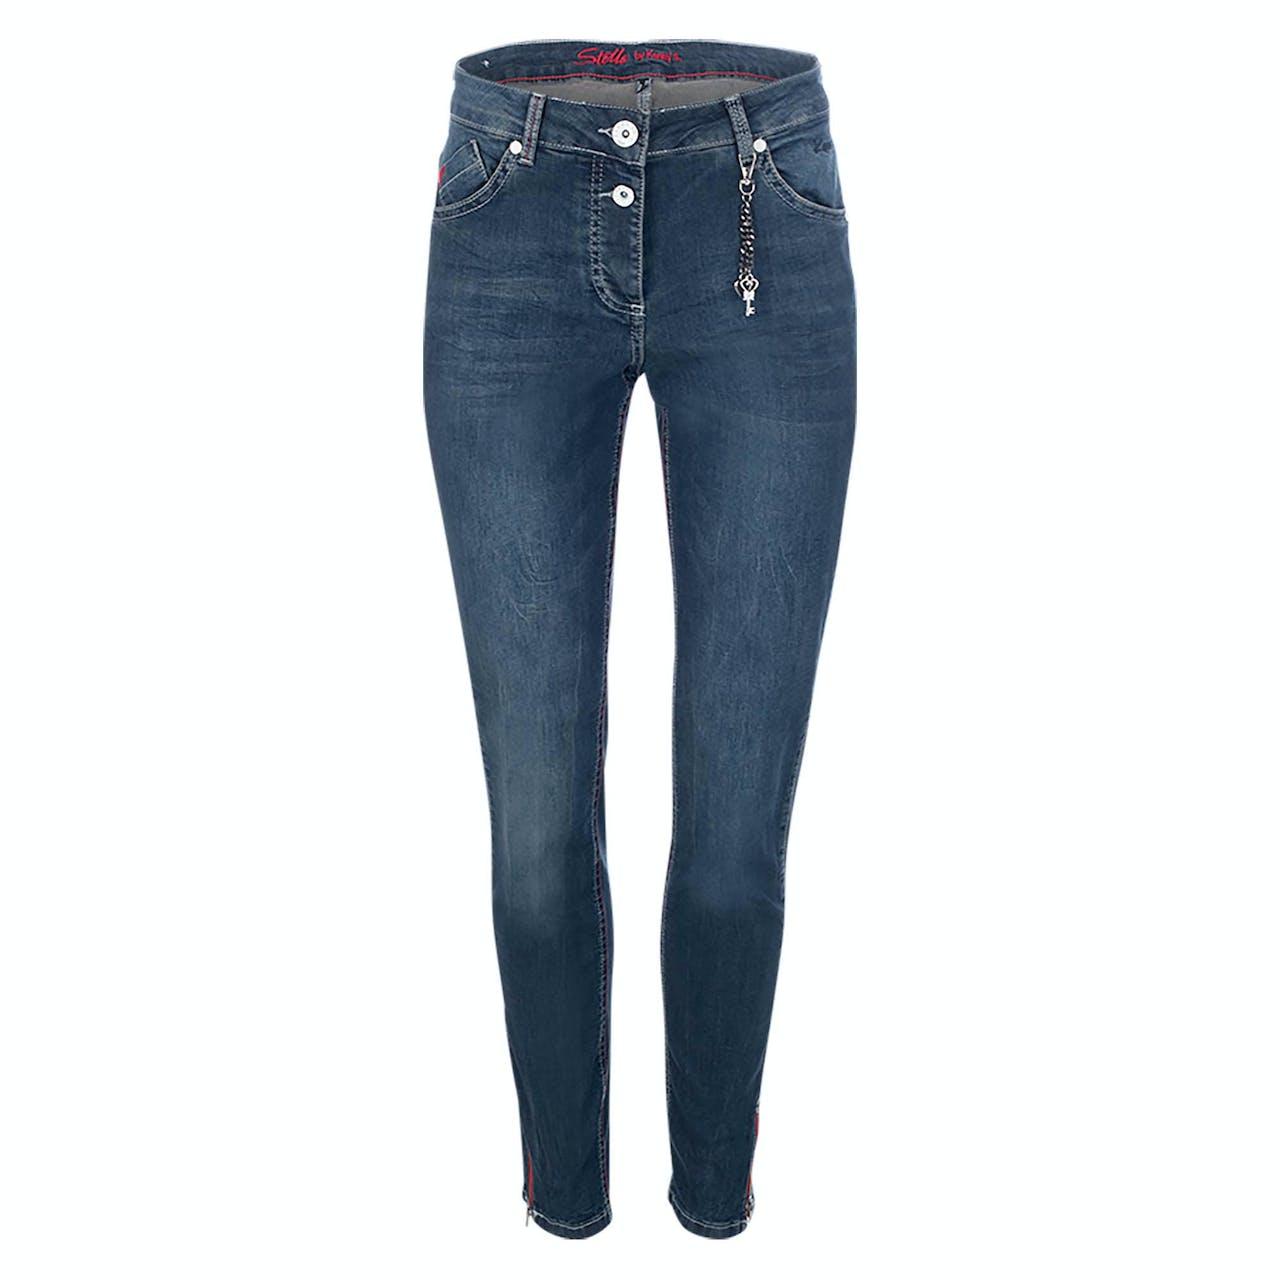 Jeans - Slim Fit - Stella